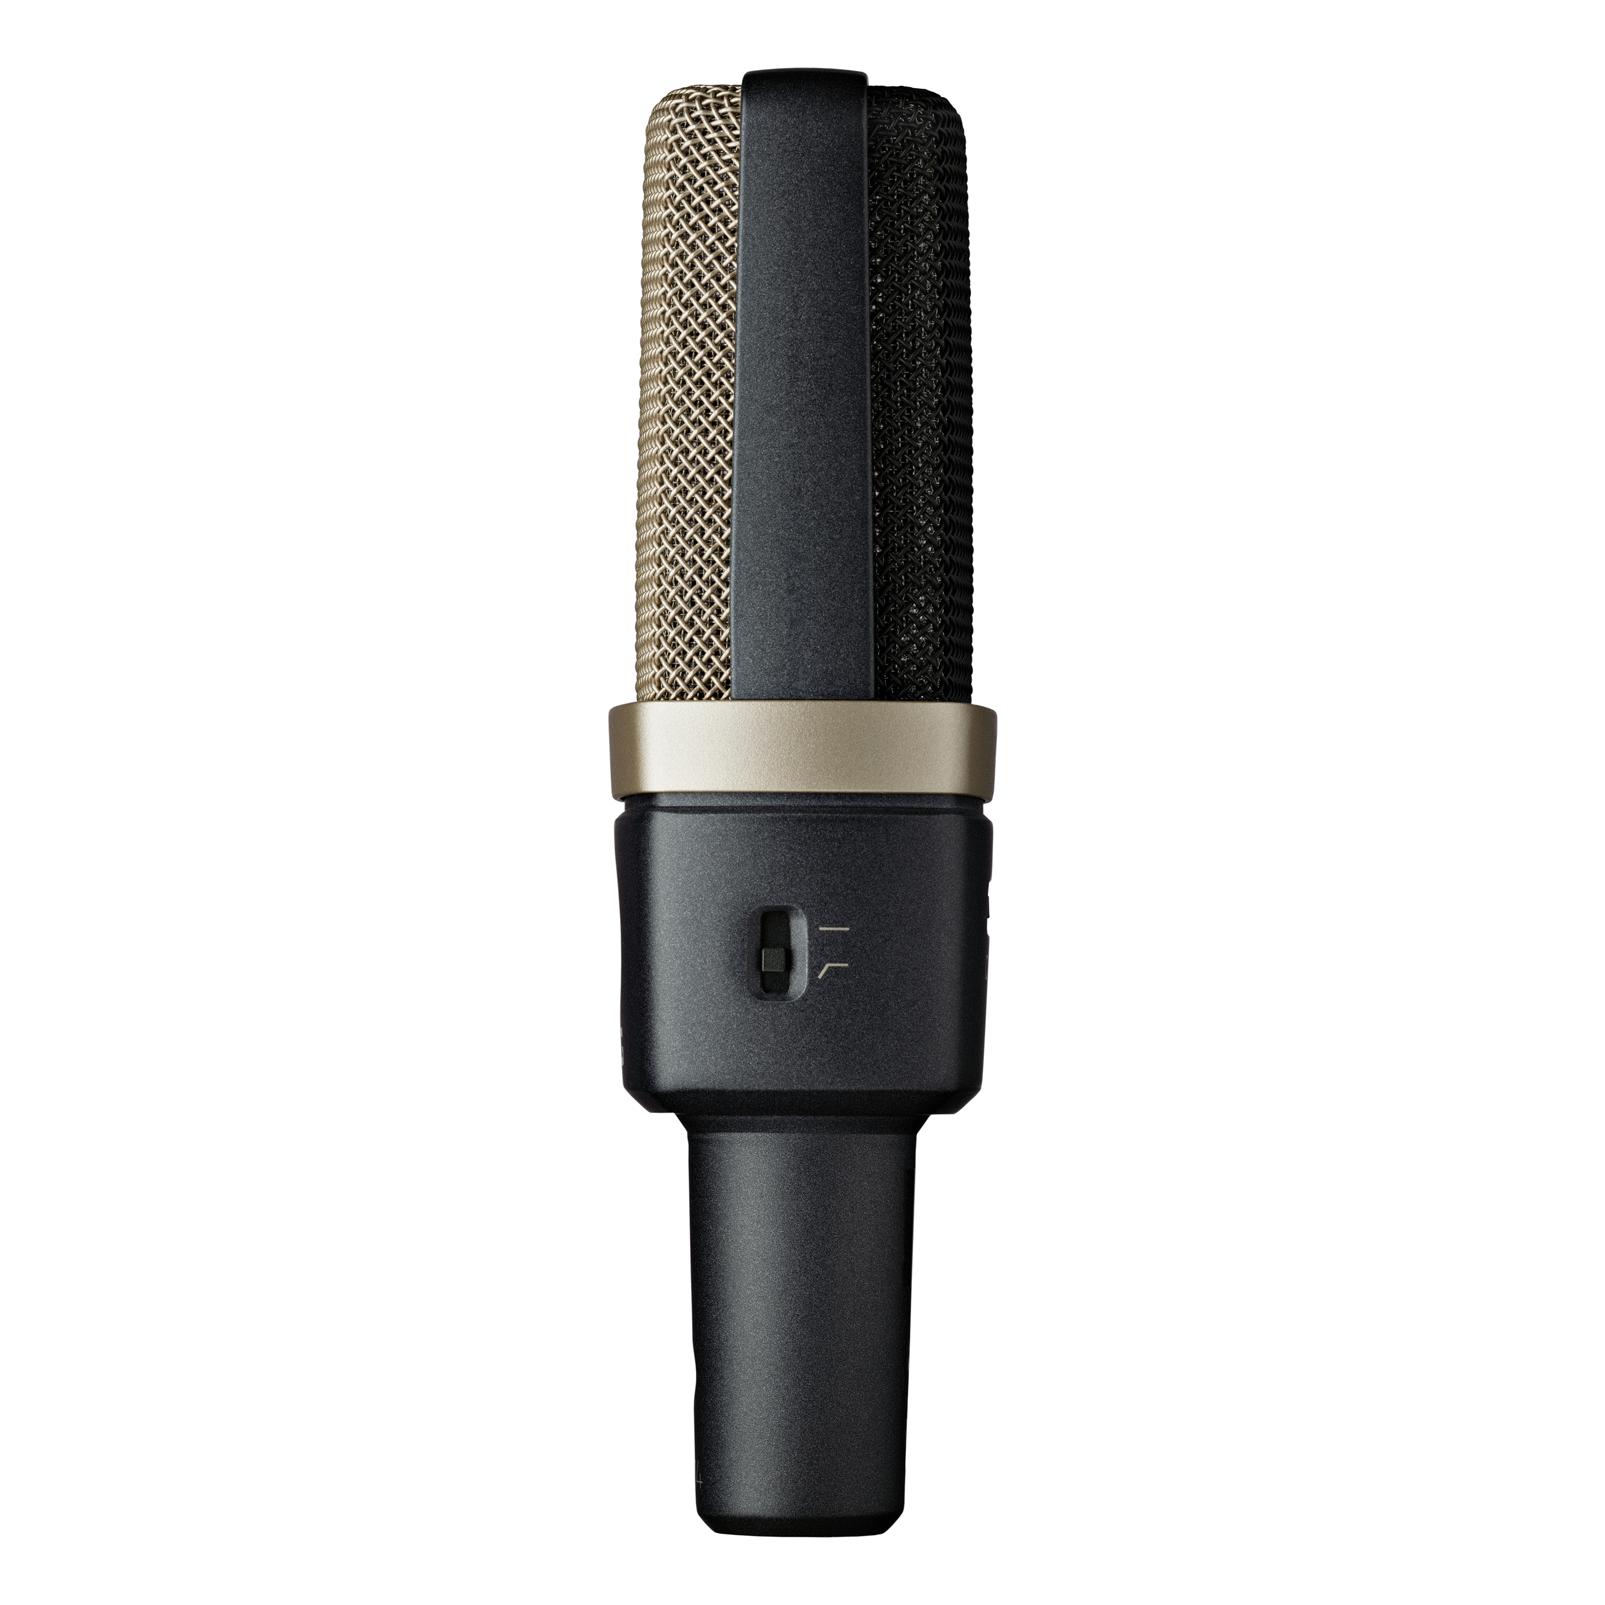 C314 Matched Pair - Black - Matched pair stereo set - Detailshot 2